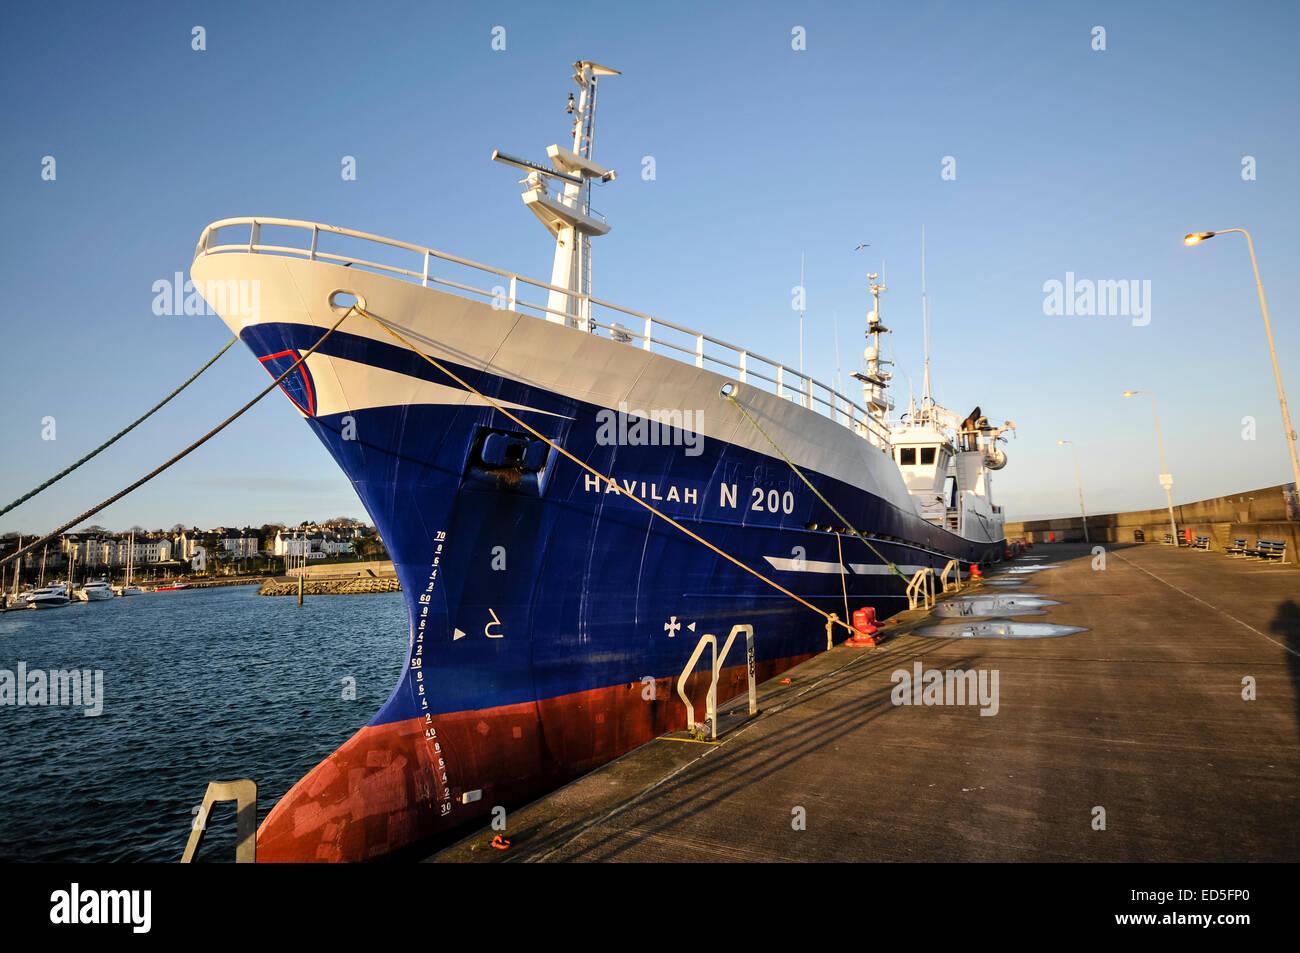 Fishing trawler 'Havilah' (N200), based in Kilkeel, but berthed at Bangor's Eisenhower Pier - Stock Image